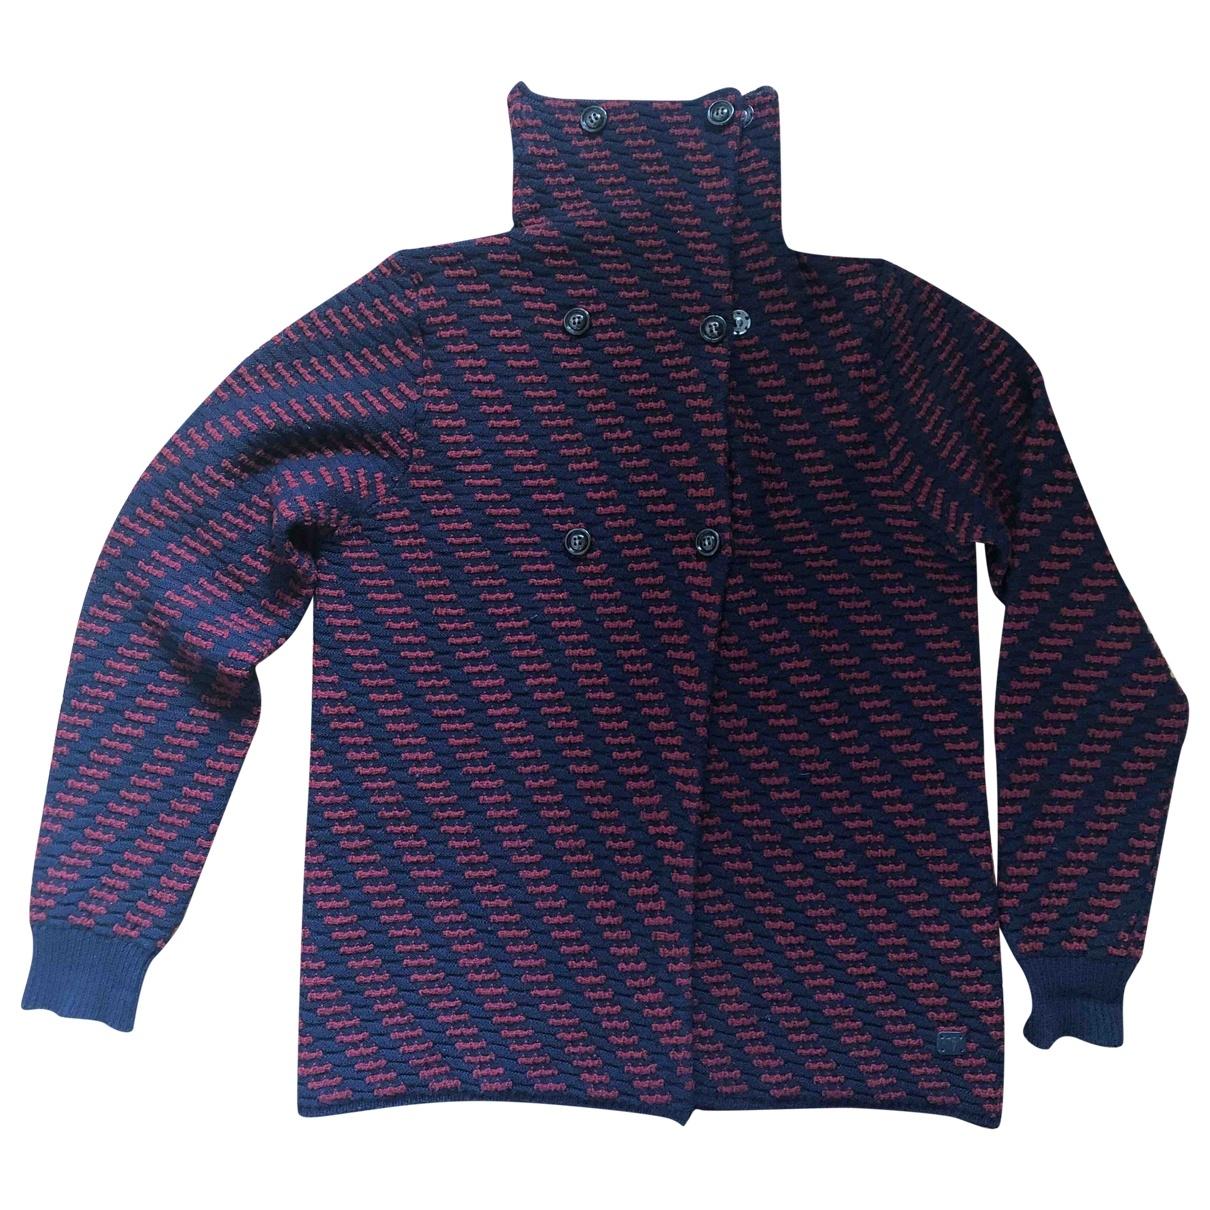 Trussardi \N Pullover in  Bunt Wolle